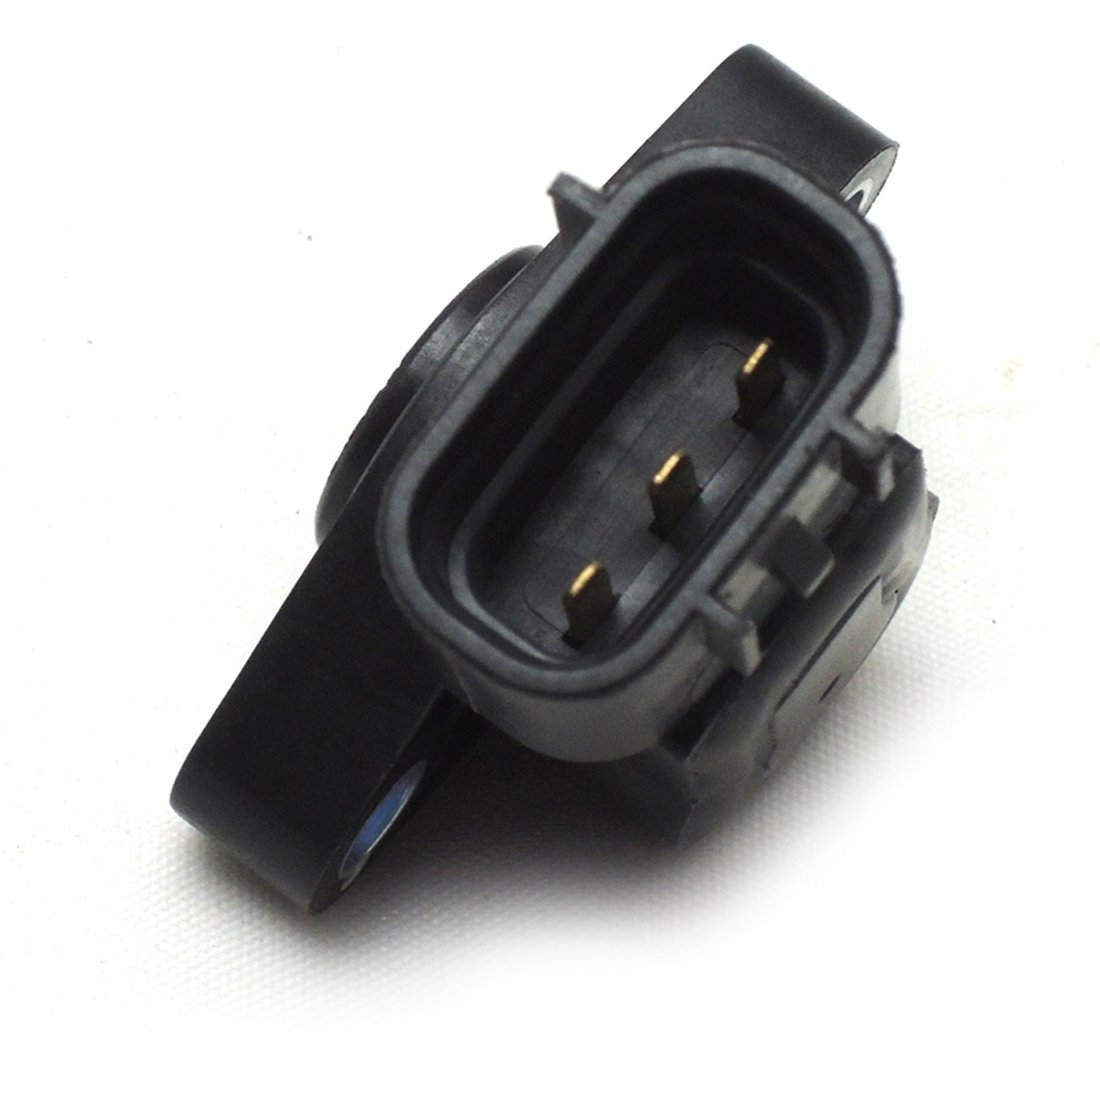 Amazon.com: Angle Sensor with o-ring for HONDA TRX 350FE 350TE 38800-HN5-A11: Automotive